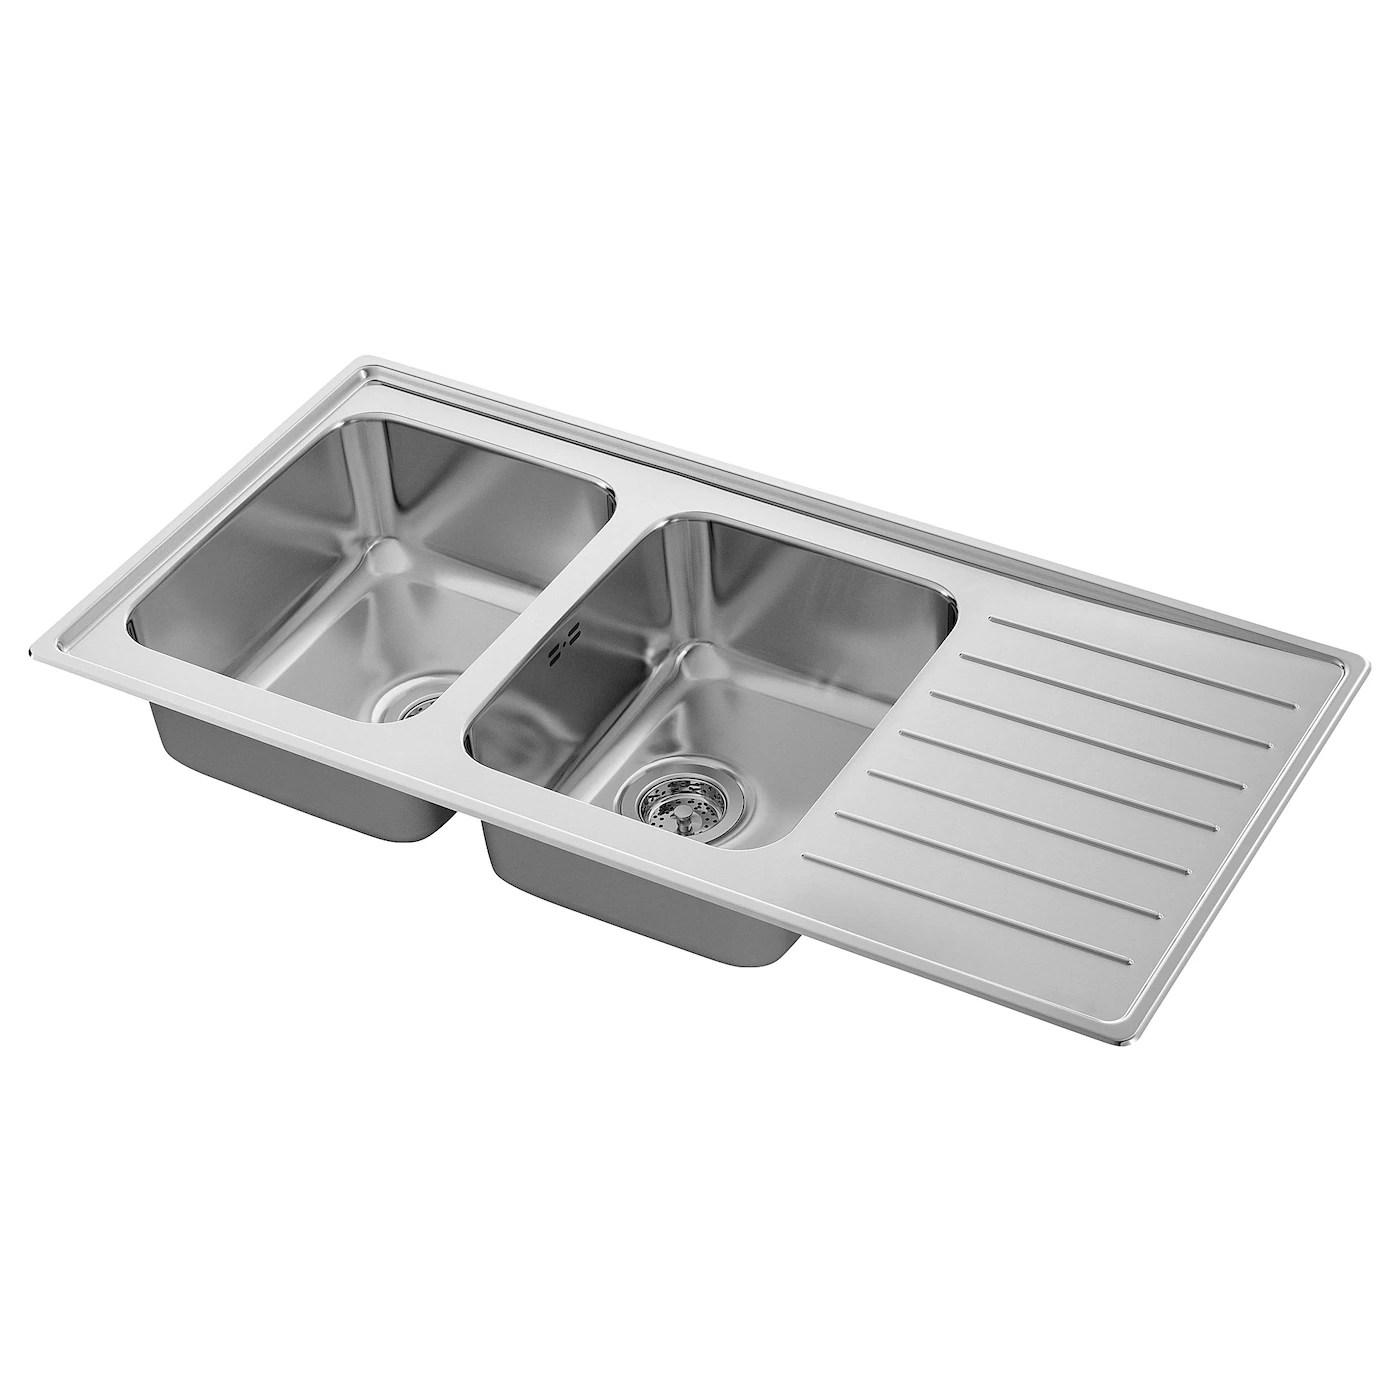 vattudalen inset sink 2 bowls with drainboard stainless steel 110x53 cm